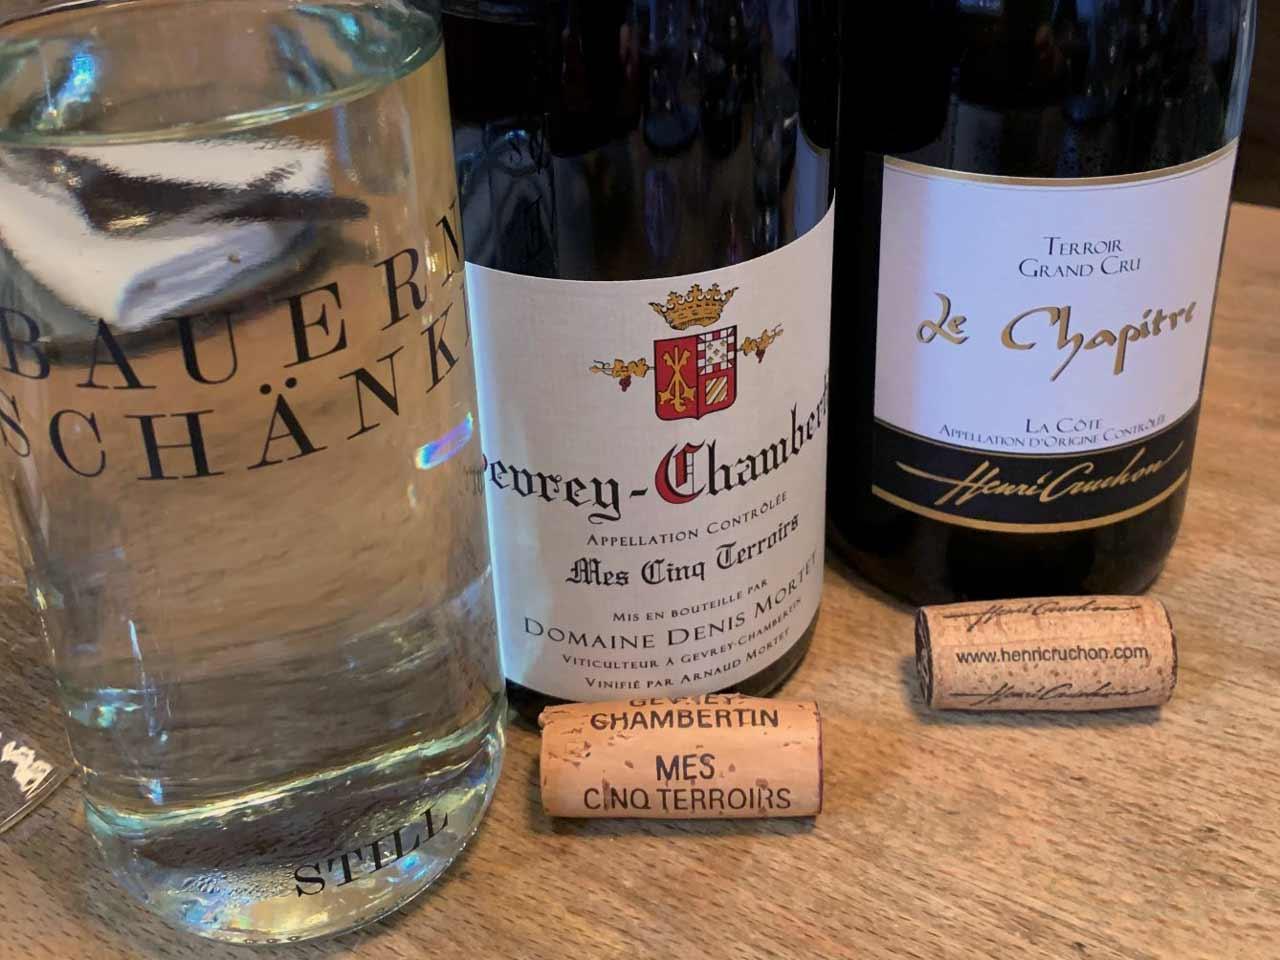 2014 Gevrey-Chambertin Mes Cinq Terroirs